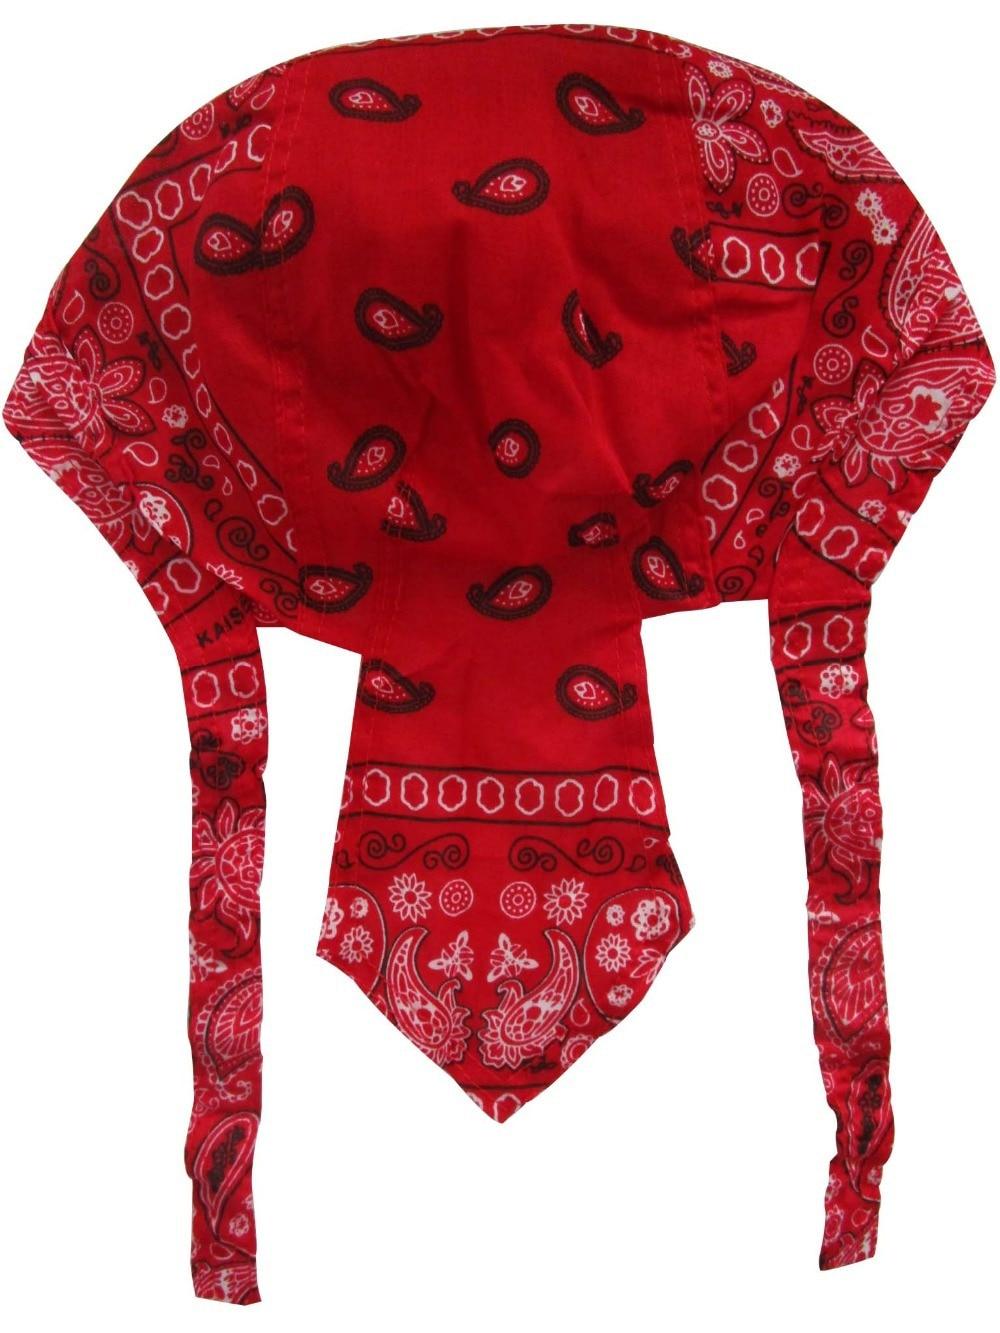 Free Shipping 2017 Cotton Red Paisley Bandana Head Wraps Durag Caps For Mens